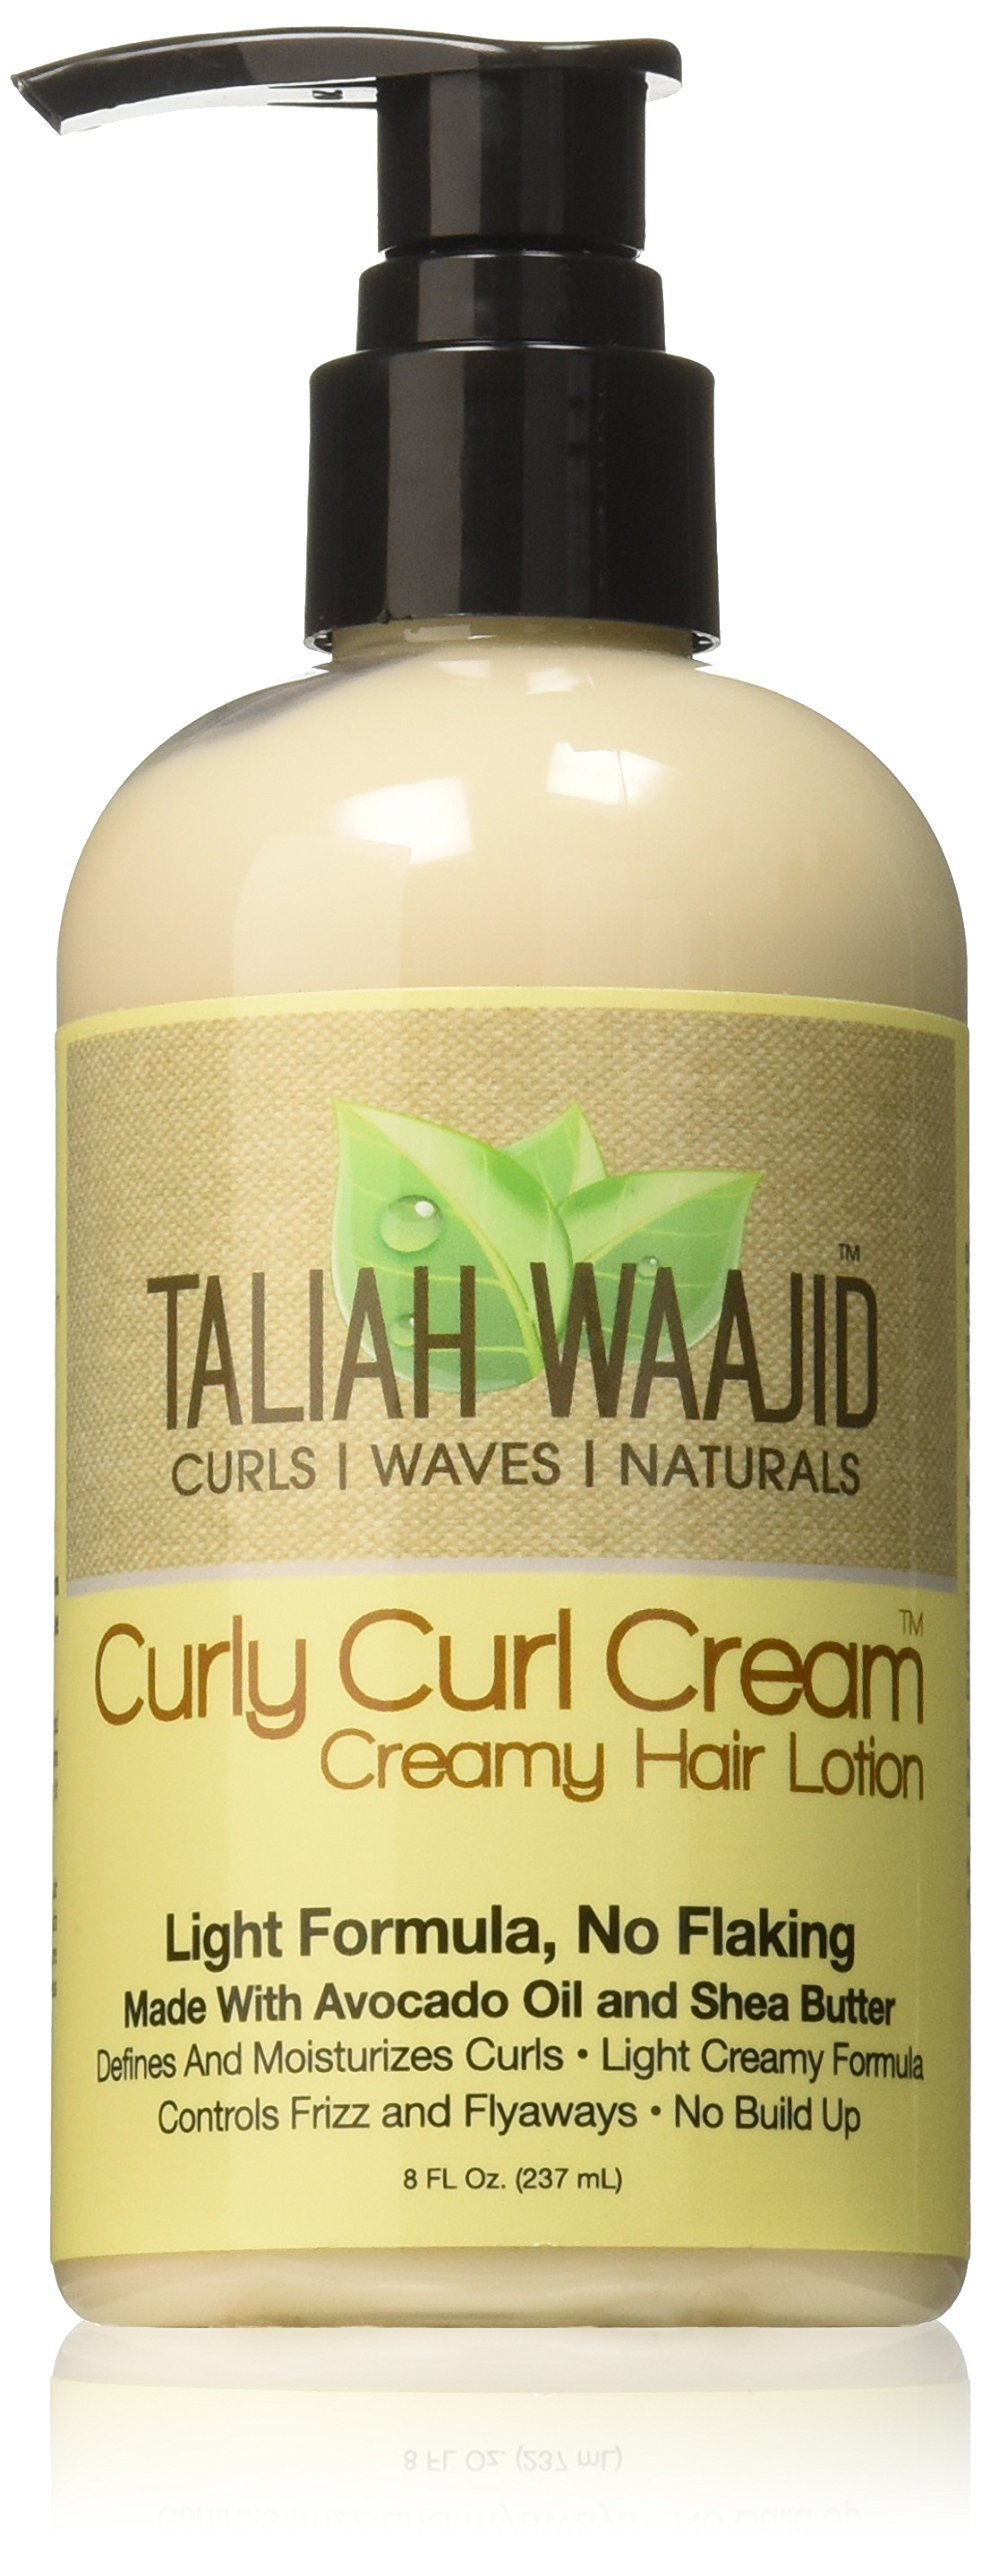 Taliah Waajid Curly Cream Creamy Hair Lotion,8 oz